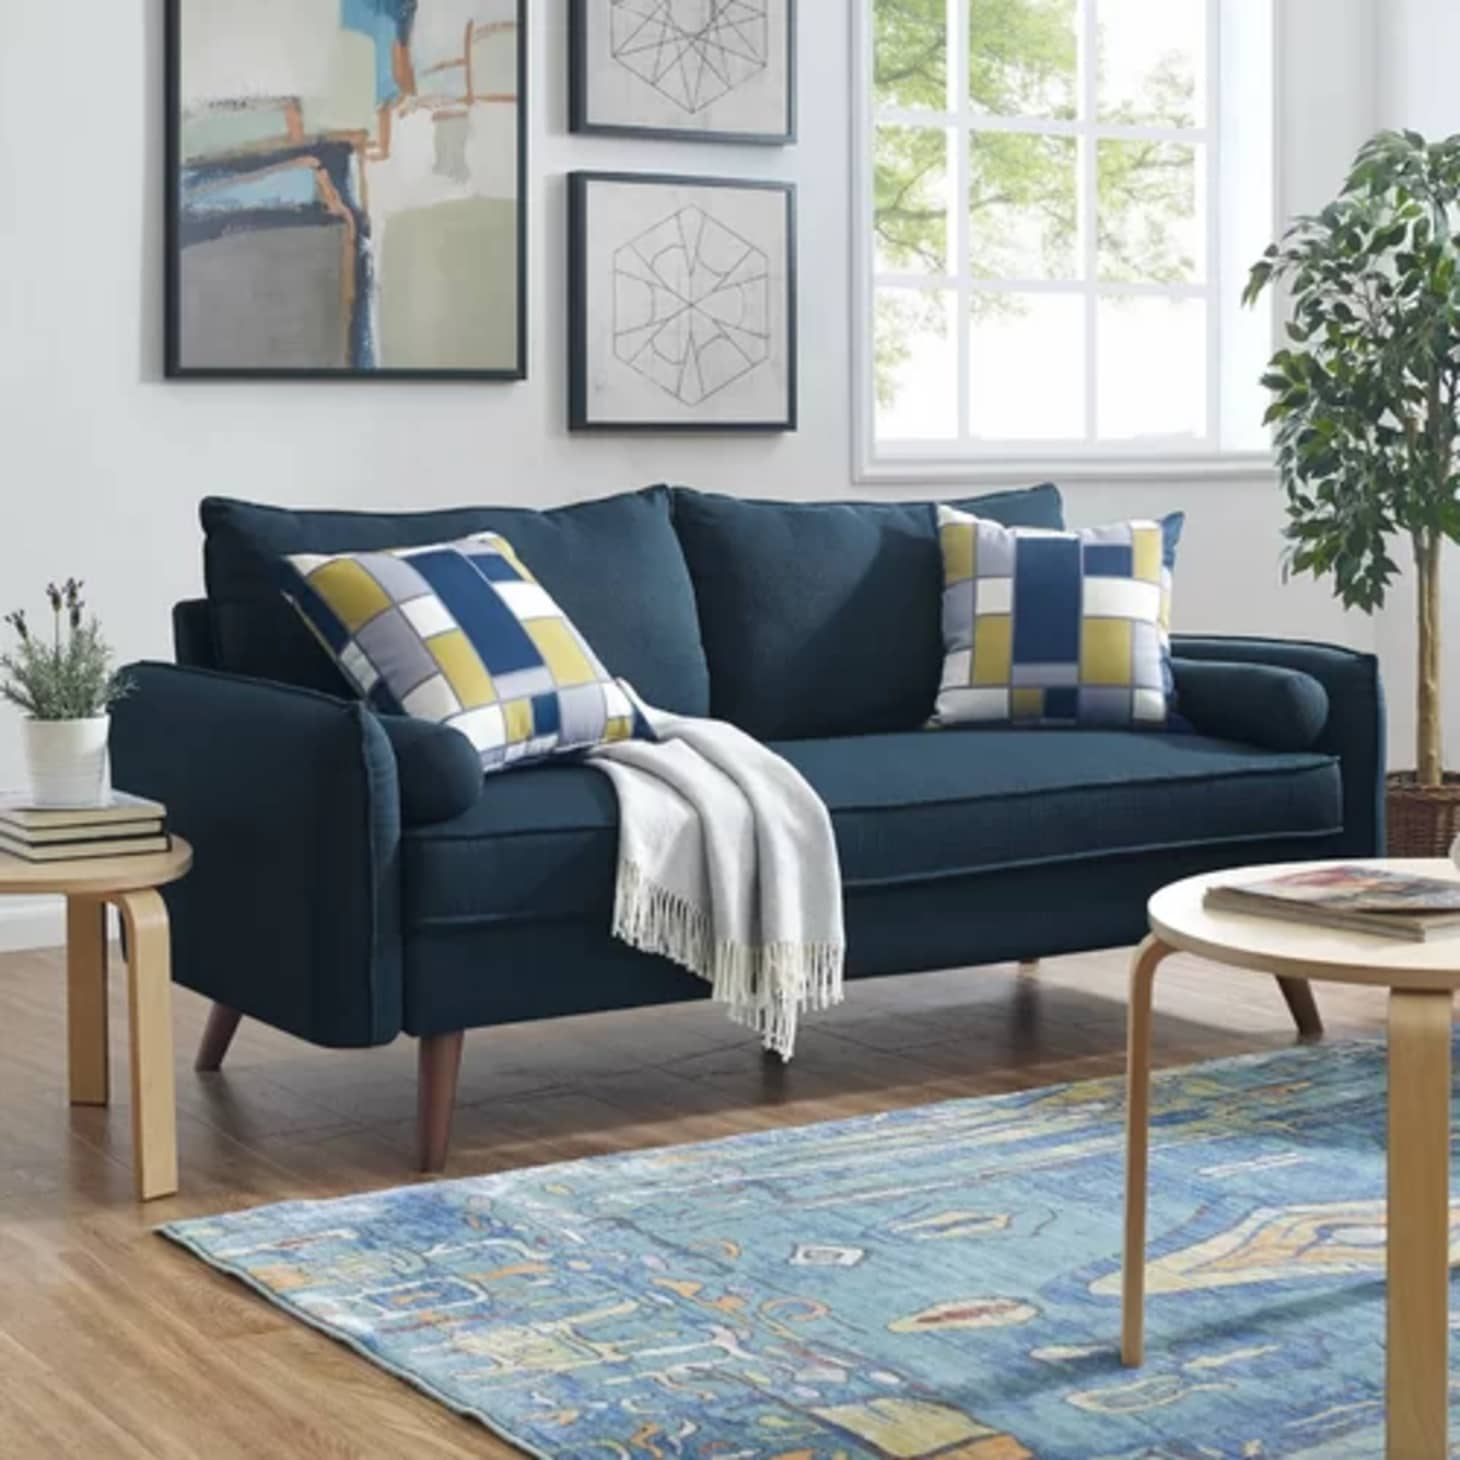 Pleasant Allmodern Sofa Sale Home Deals September 2019 Apartment Ncnpc Chair Design For Home Ncnpcorg